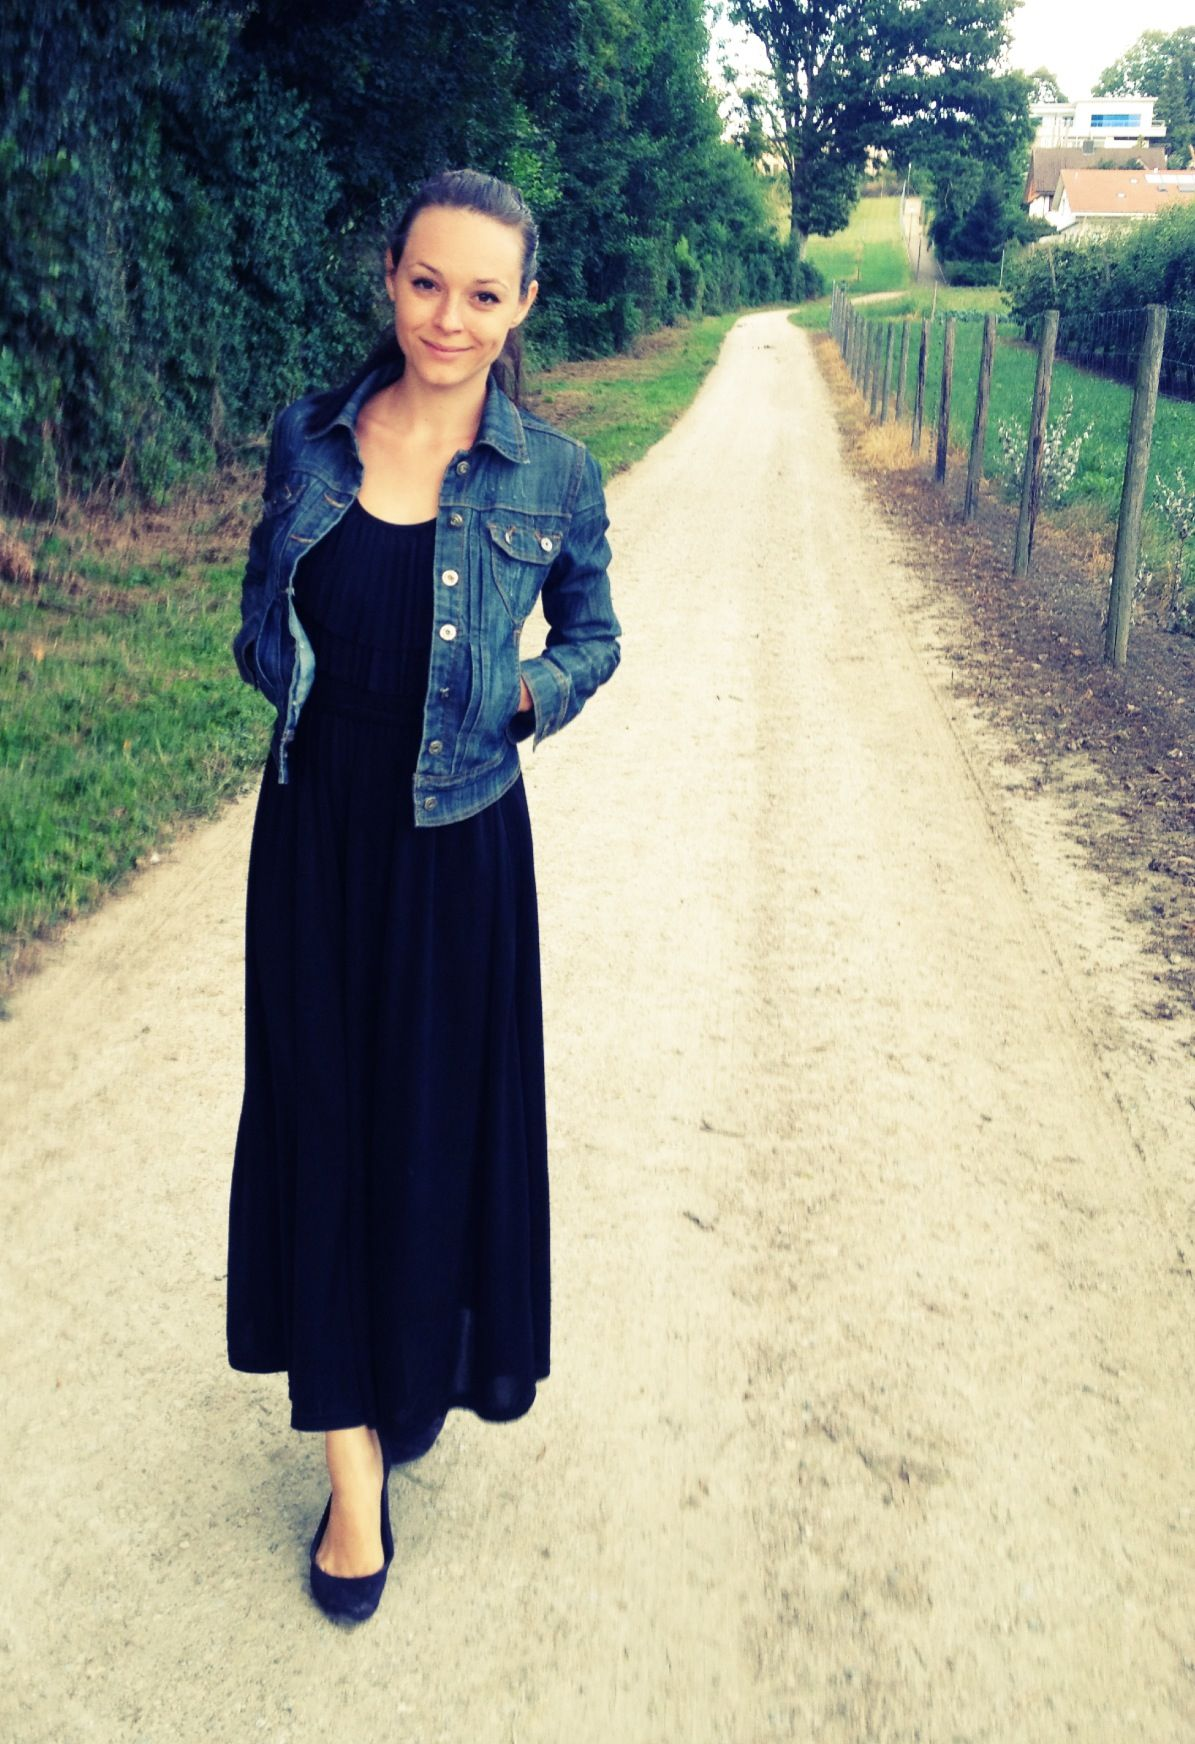 Pin By Emi C On My Style Outfits Fashion Denim Jacket With Dress Long Black Dress [ 1744 x 1195 Pixel ]